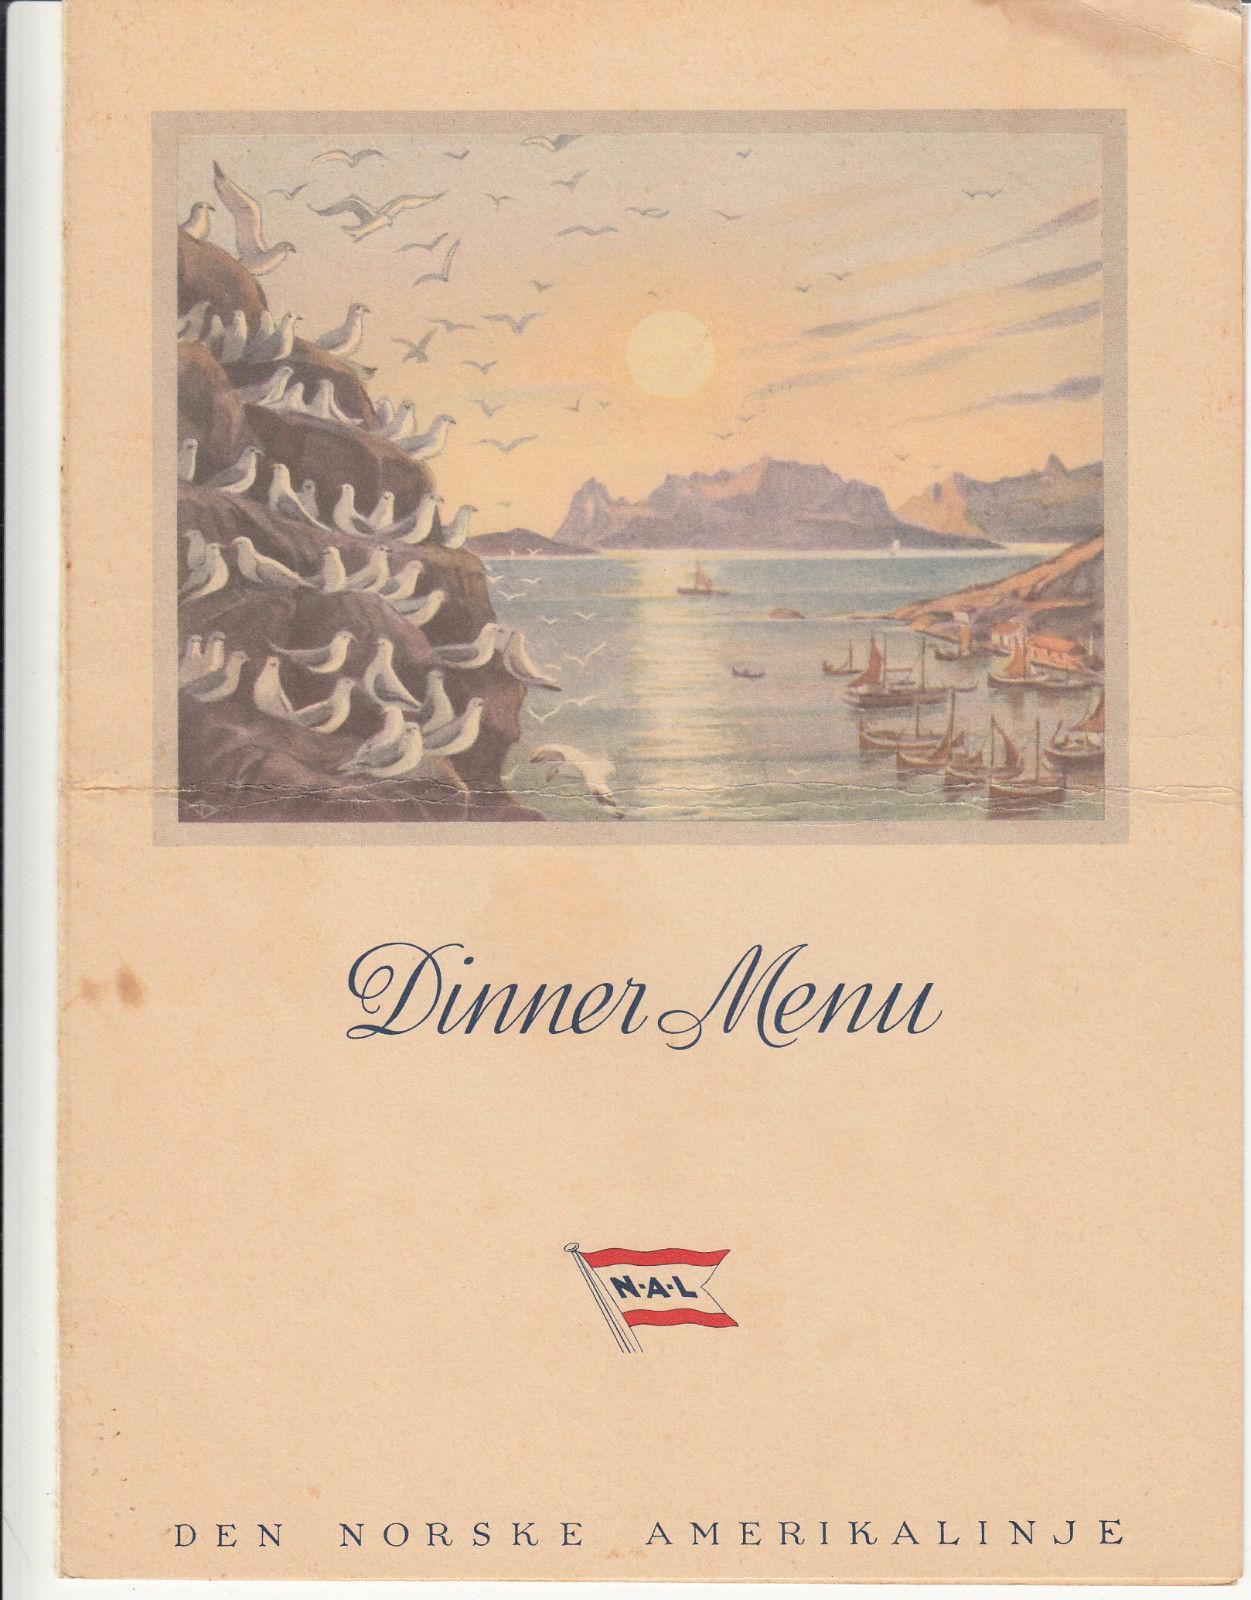 Den Norske Amerikalinje NAL Cruise Line Menu 1957